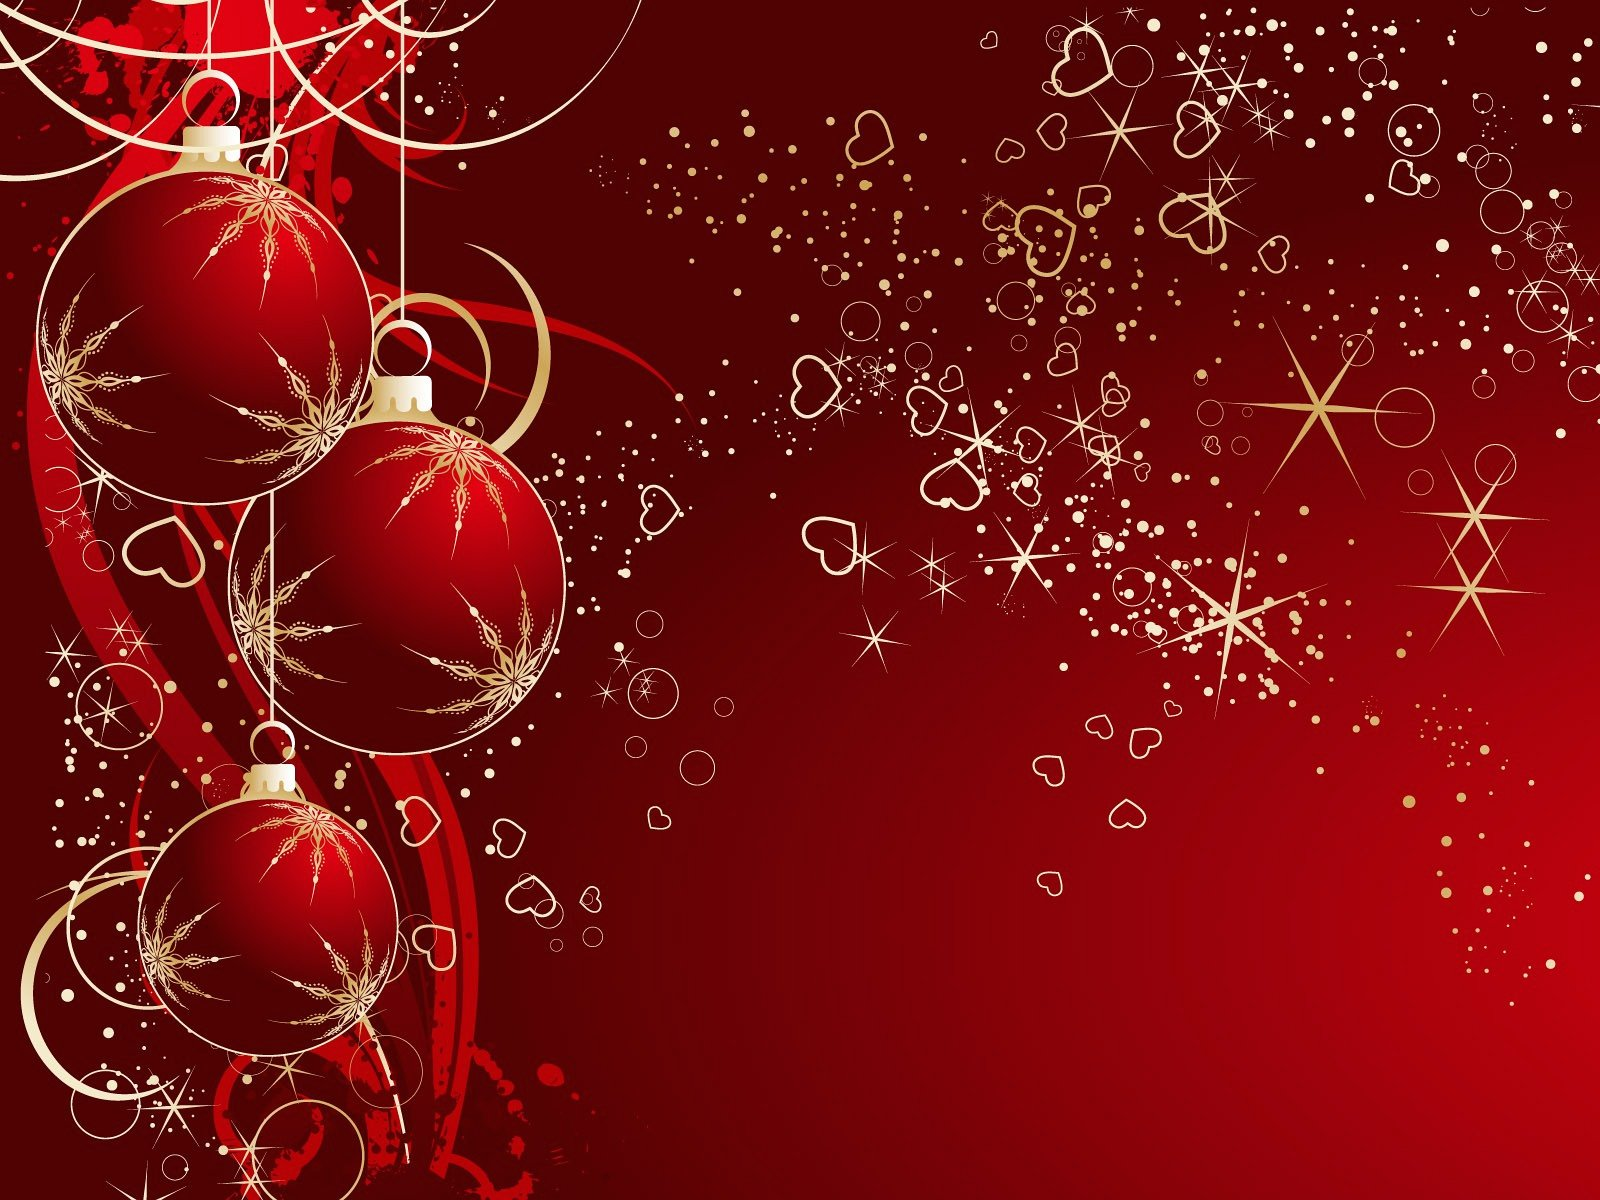 Elegant Christmas Background Hd.49 Elegant Christmas Wallpaper For Desktop On Wallpapersafari